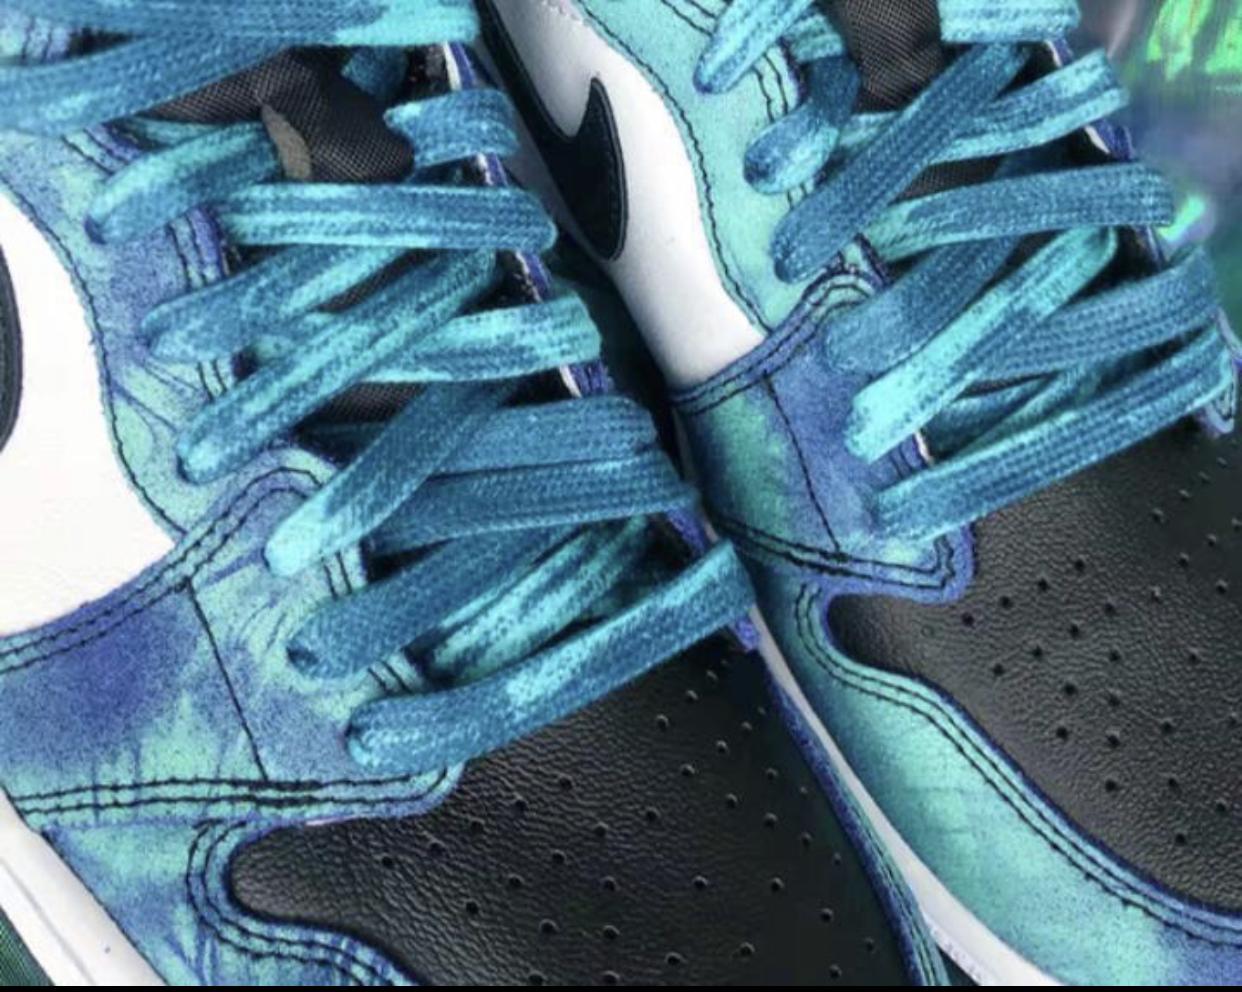 Tie Dye Laces for Jordan 1, Air Force 1 & More!